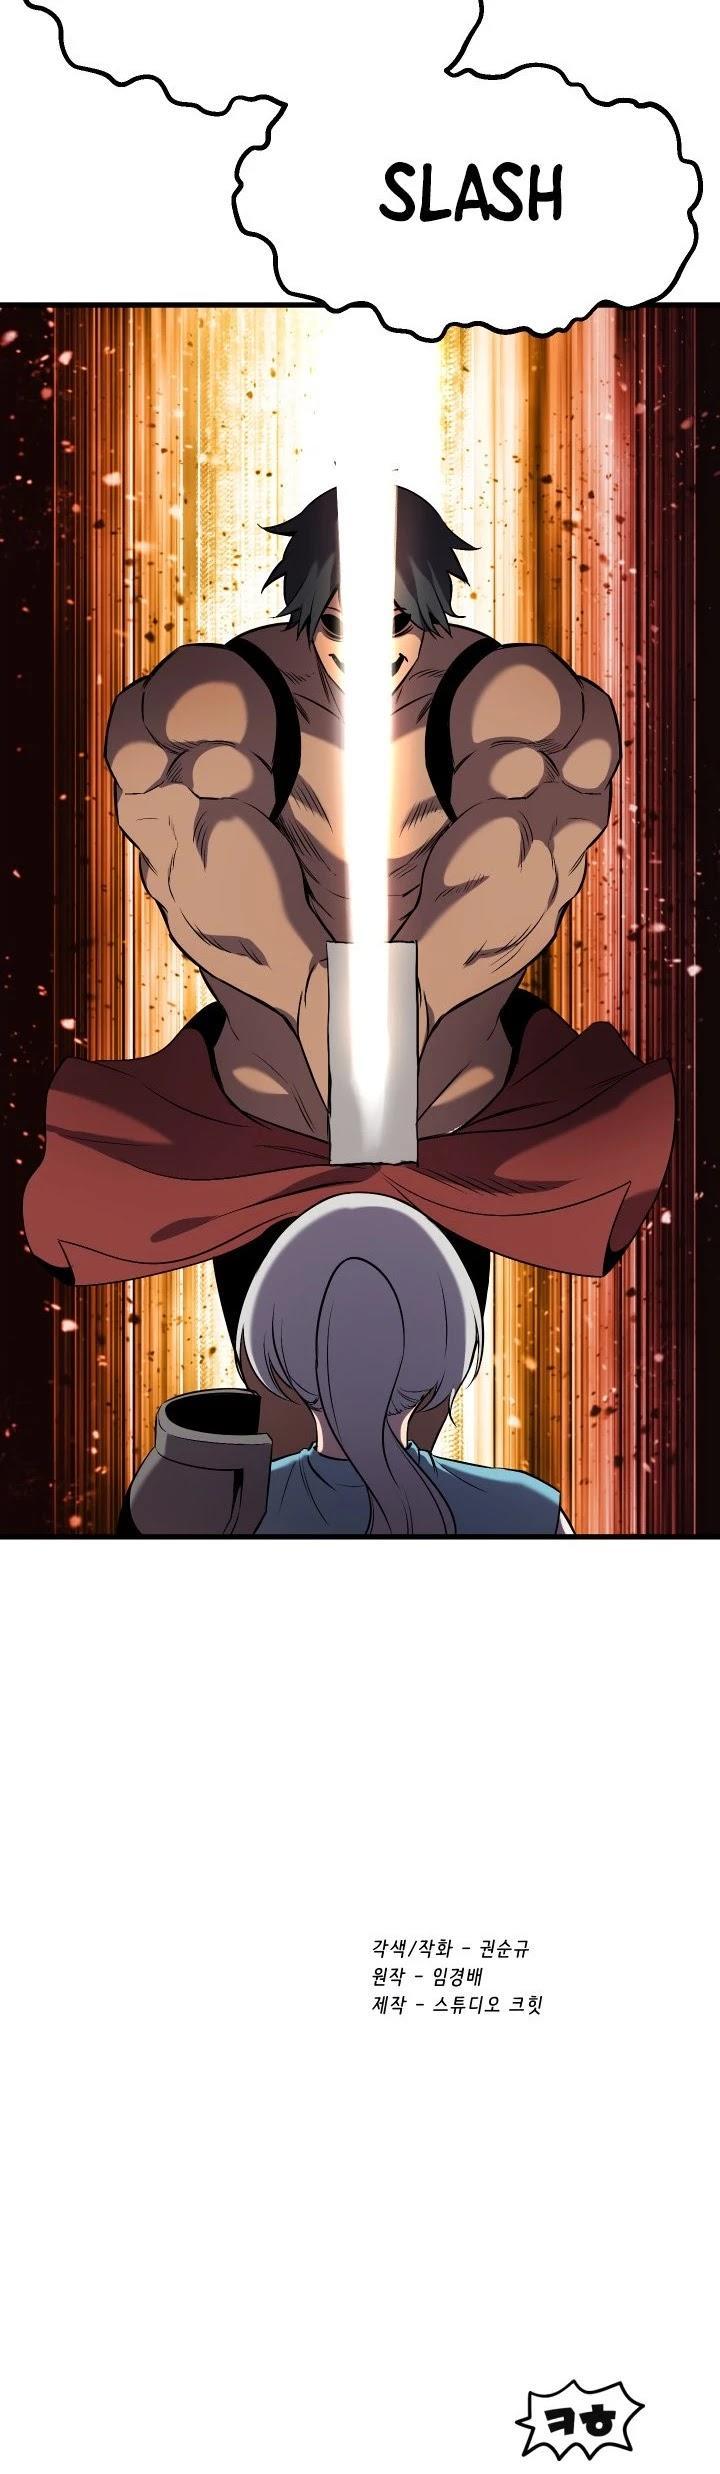 Survival Story Of A Sword King In A Fantasy World Chapter 47 page 49 - Mangakakalots.com